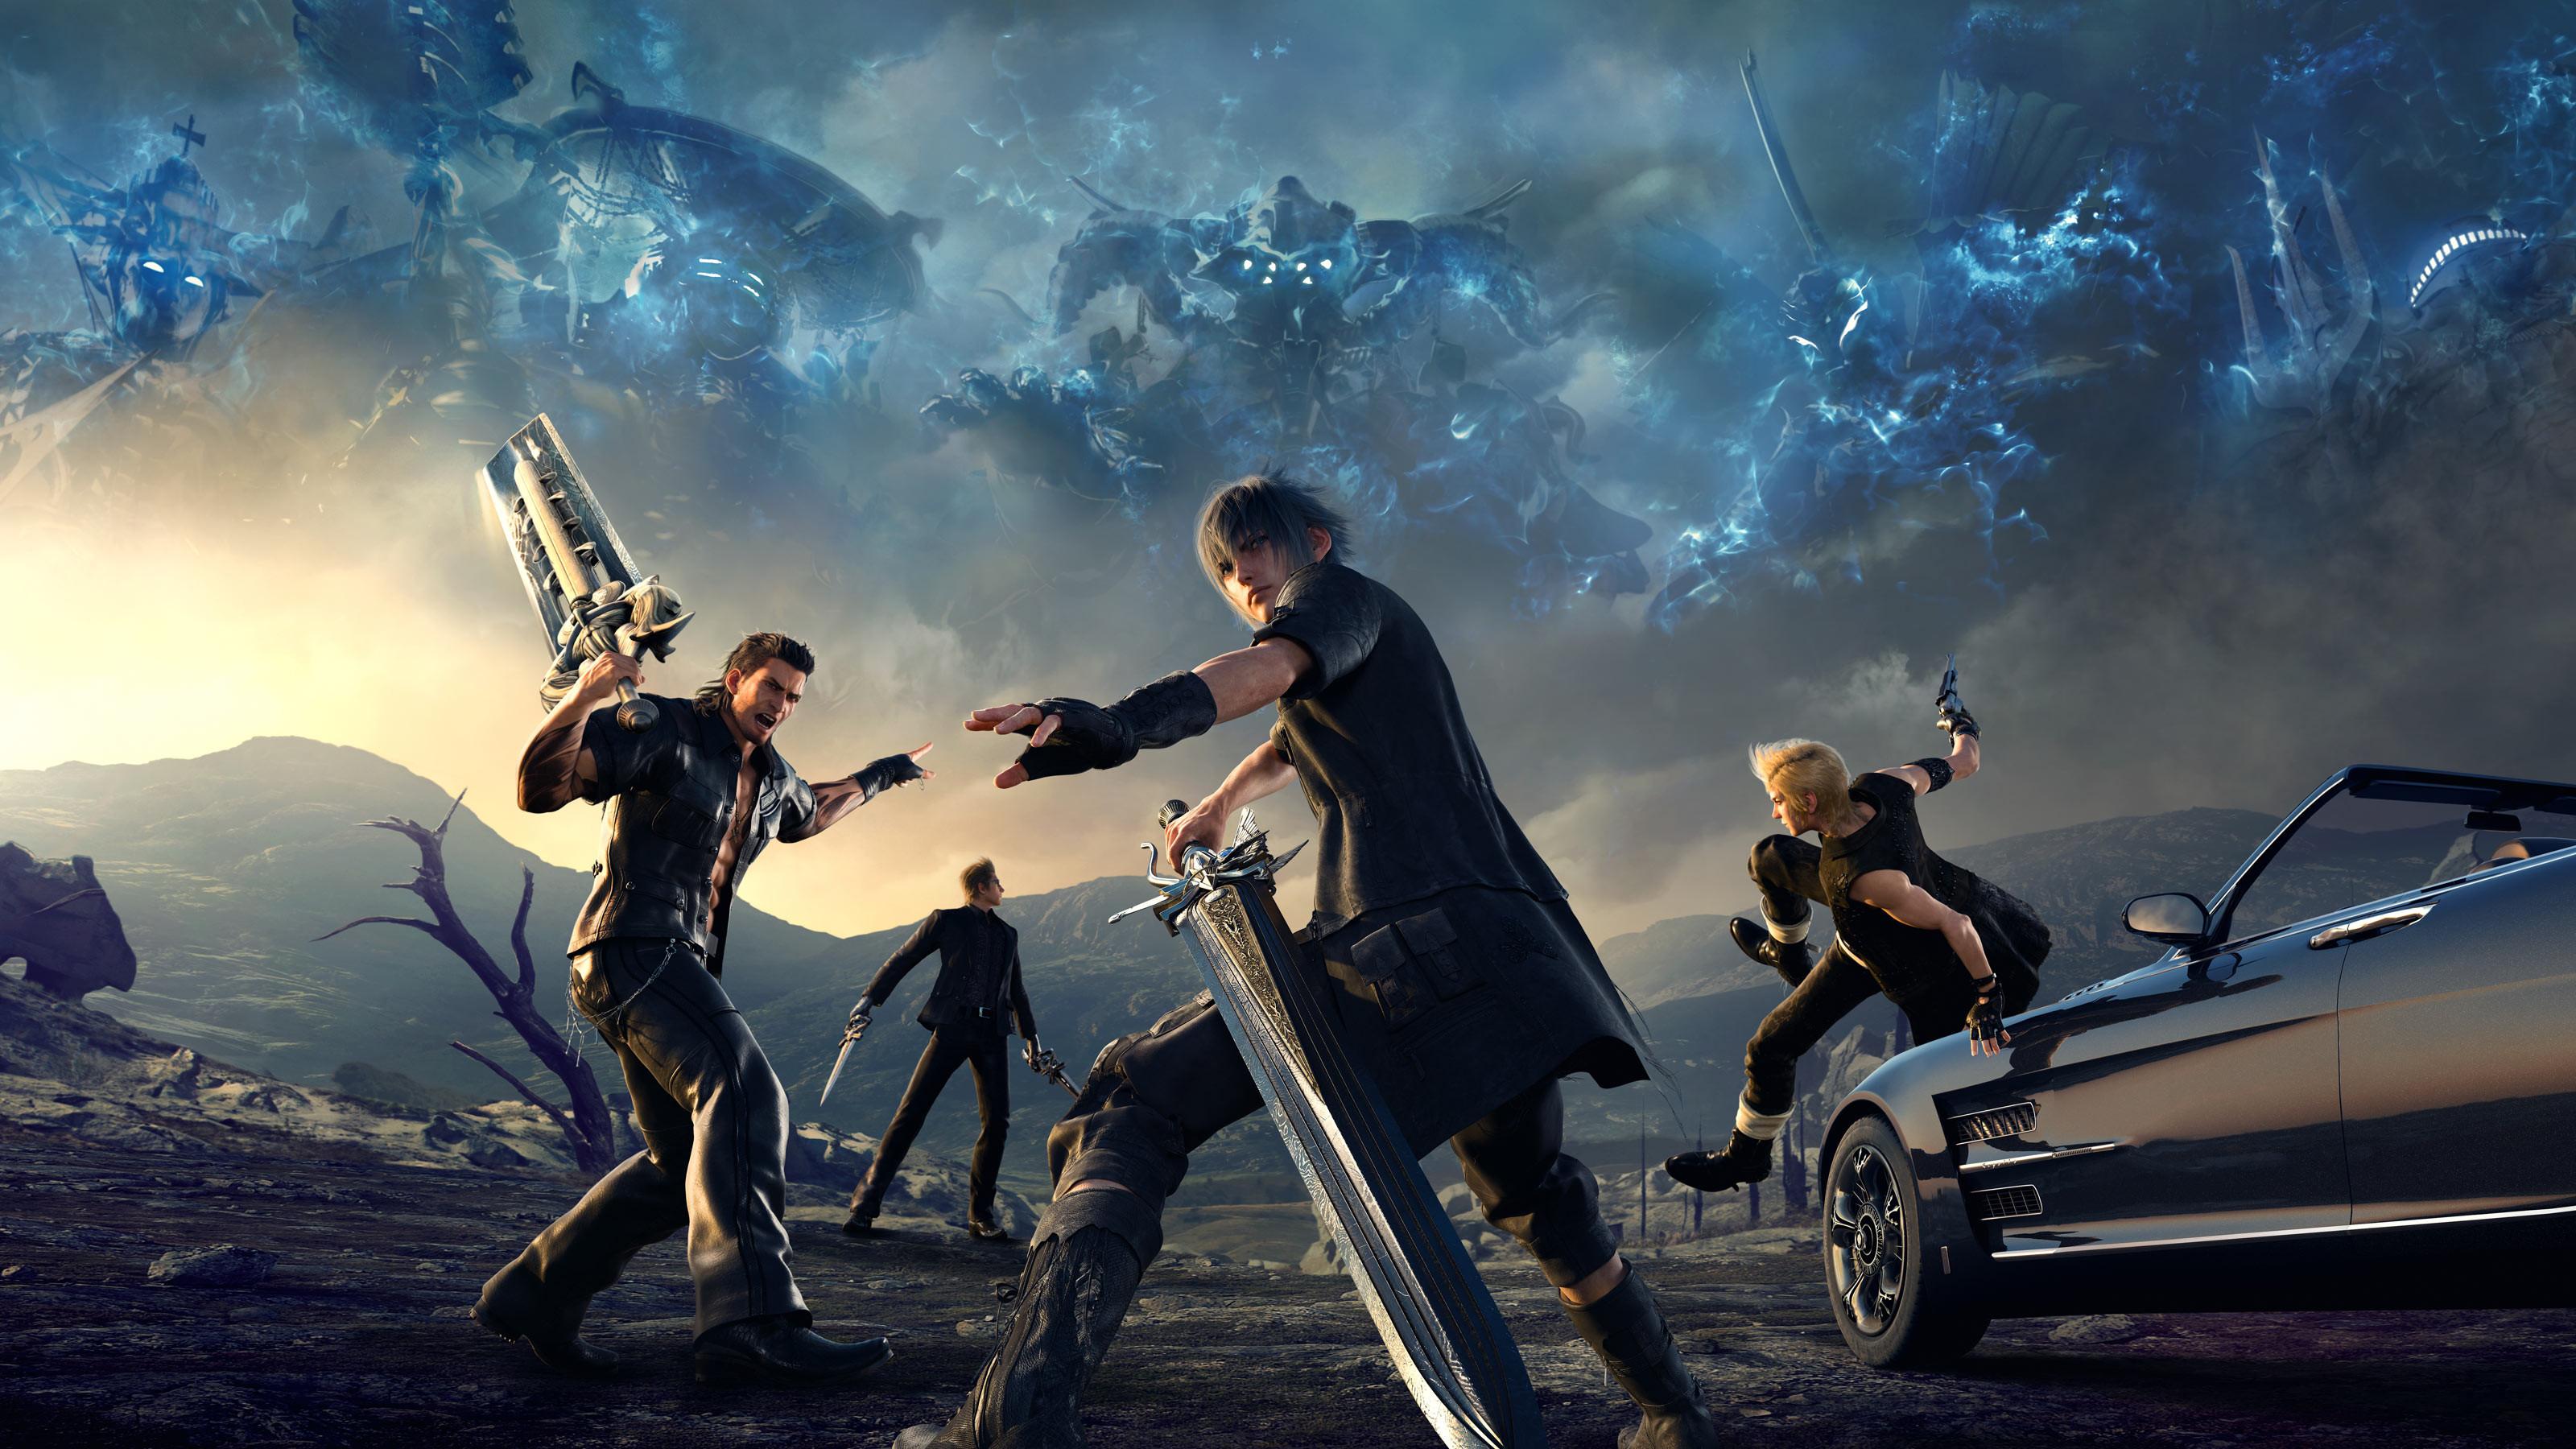 HD Wallpaper   Background ID:746998. Video Game Final Fantasy XV.  28 Like. Favorite. Deridder45